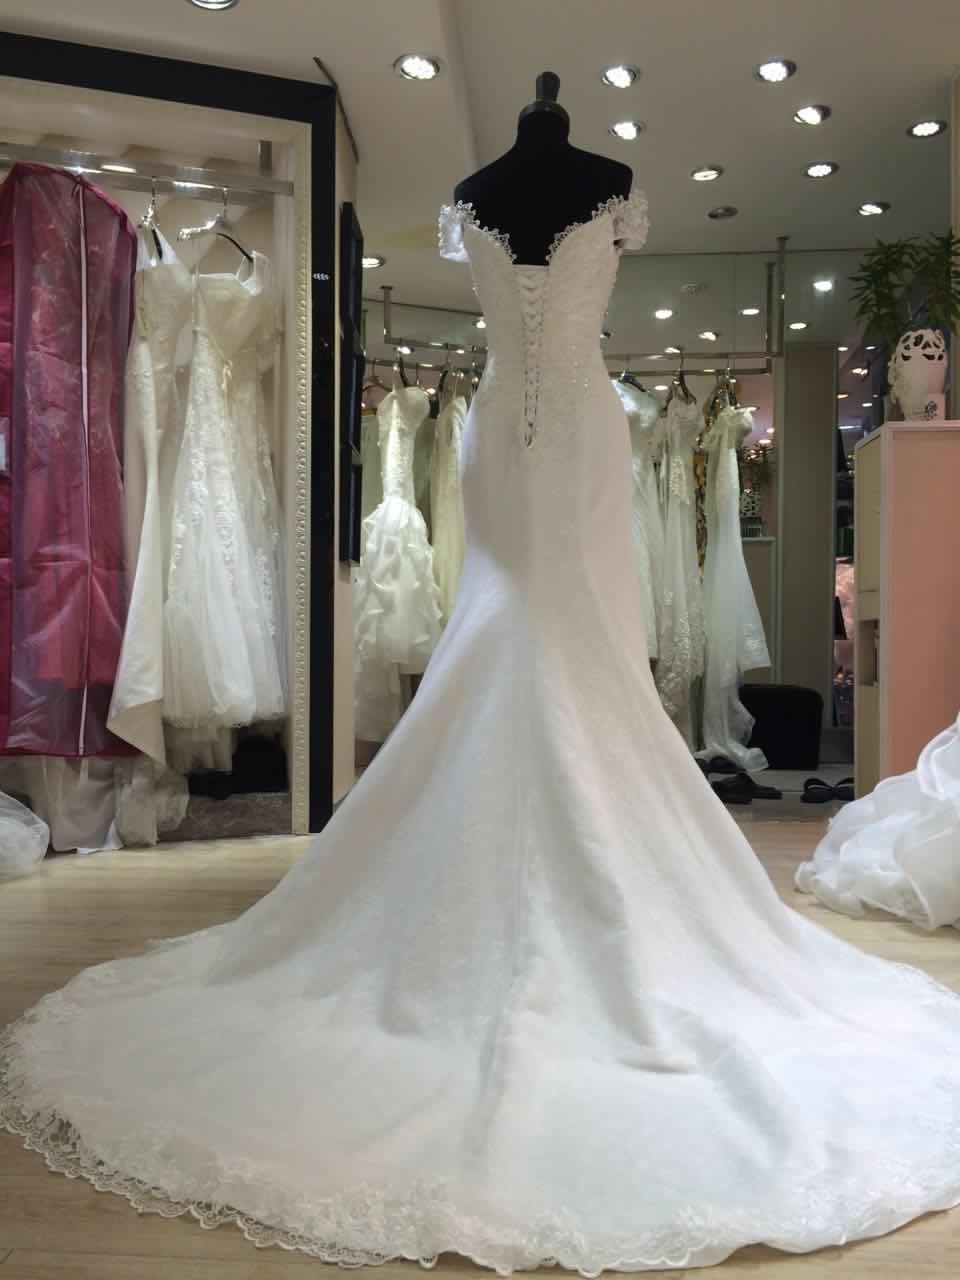 aliexpress cheap wholesale wedding dresses new style with detachable train aliexpress wedding dresses aliexpress cheap wholesale wedding dresses new style with detachable train